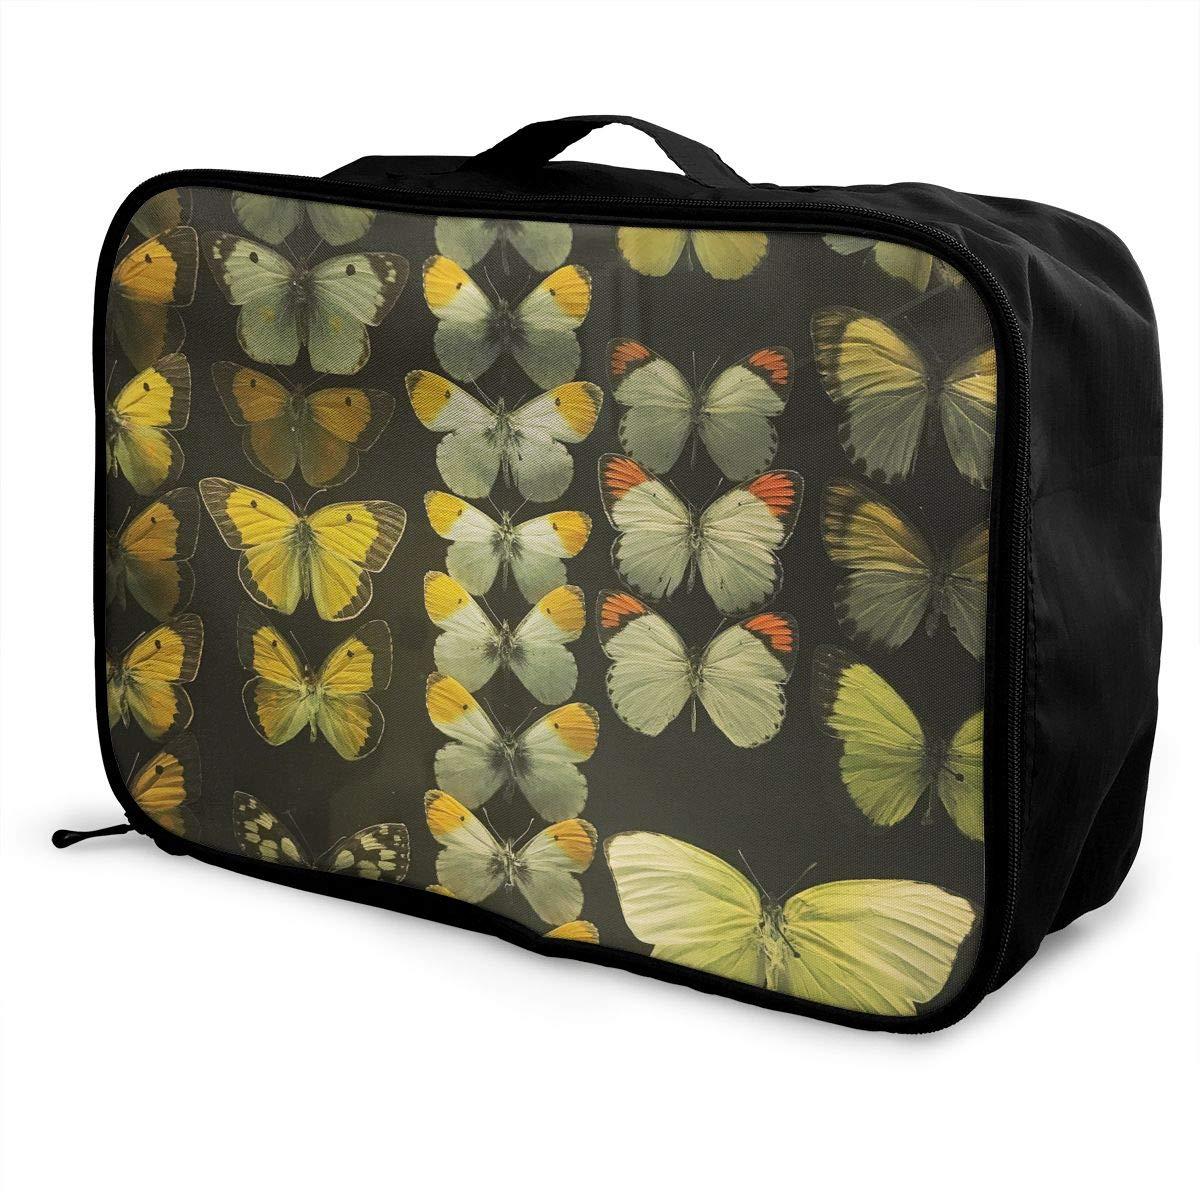 Travel Luggage Duffle Bag Lightweight Portable Handbag Butterfly Pattern Large Capacity Waterproof Foldable Storage Tote